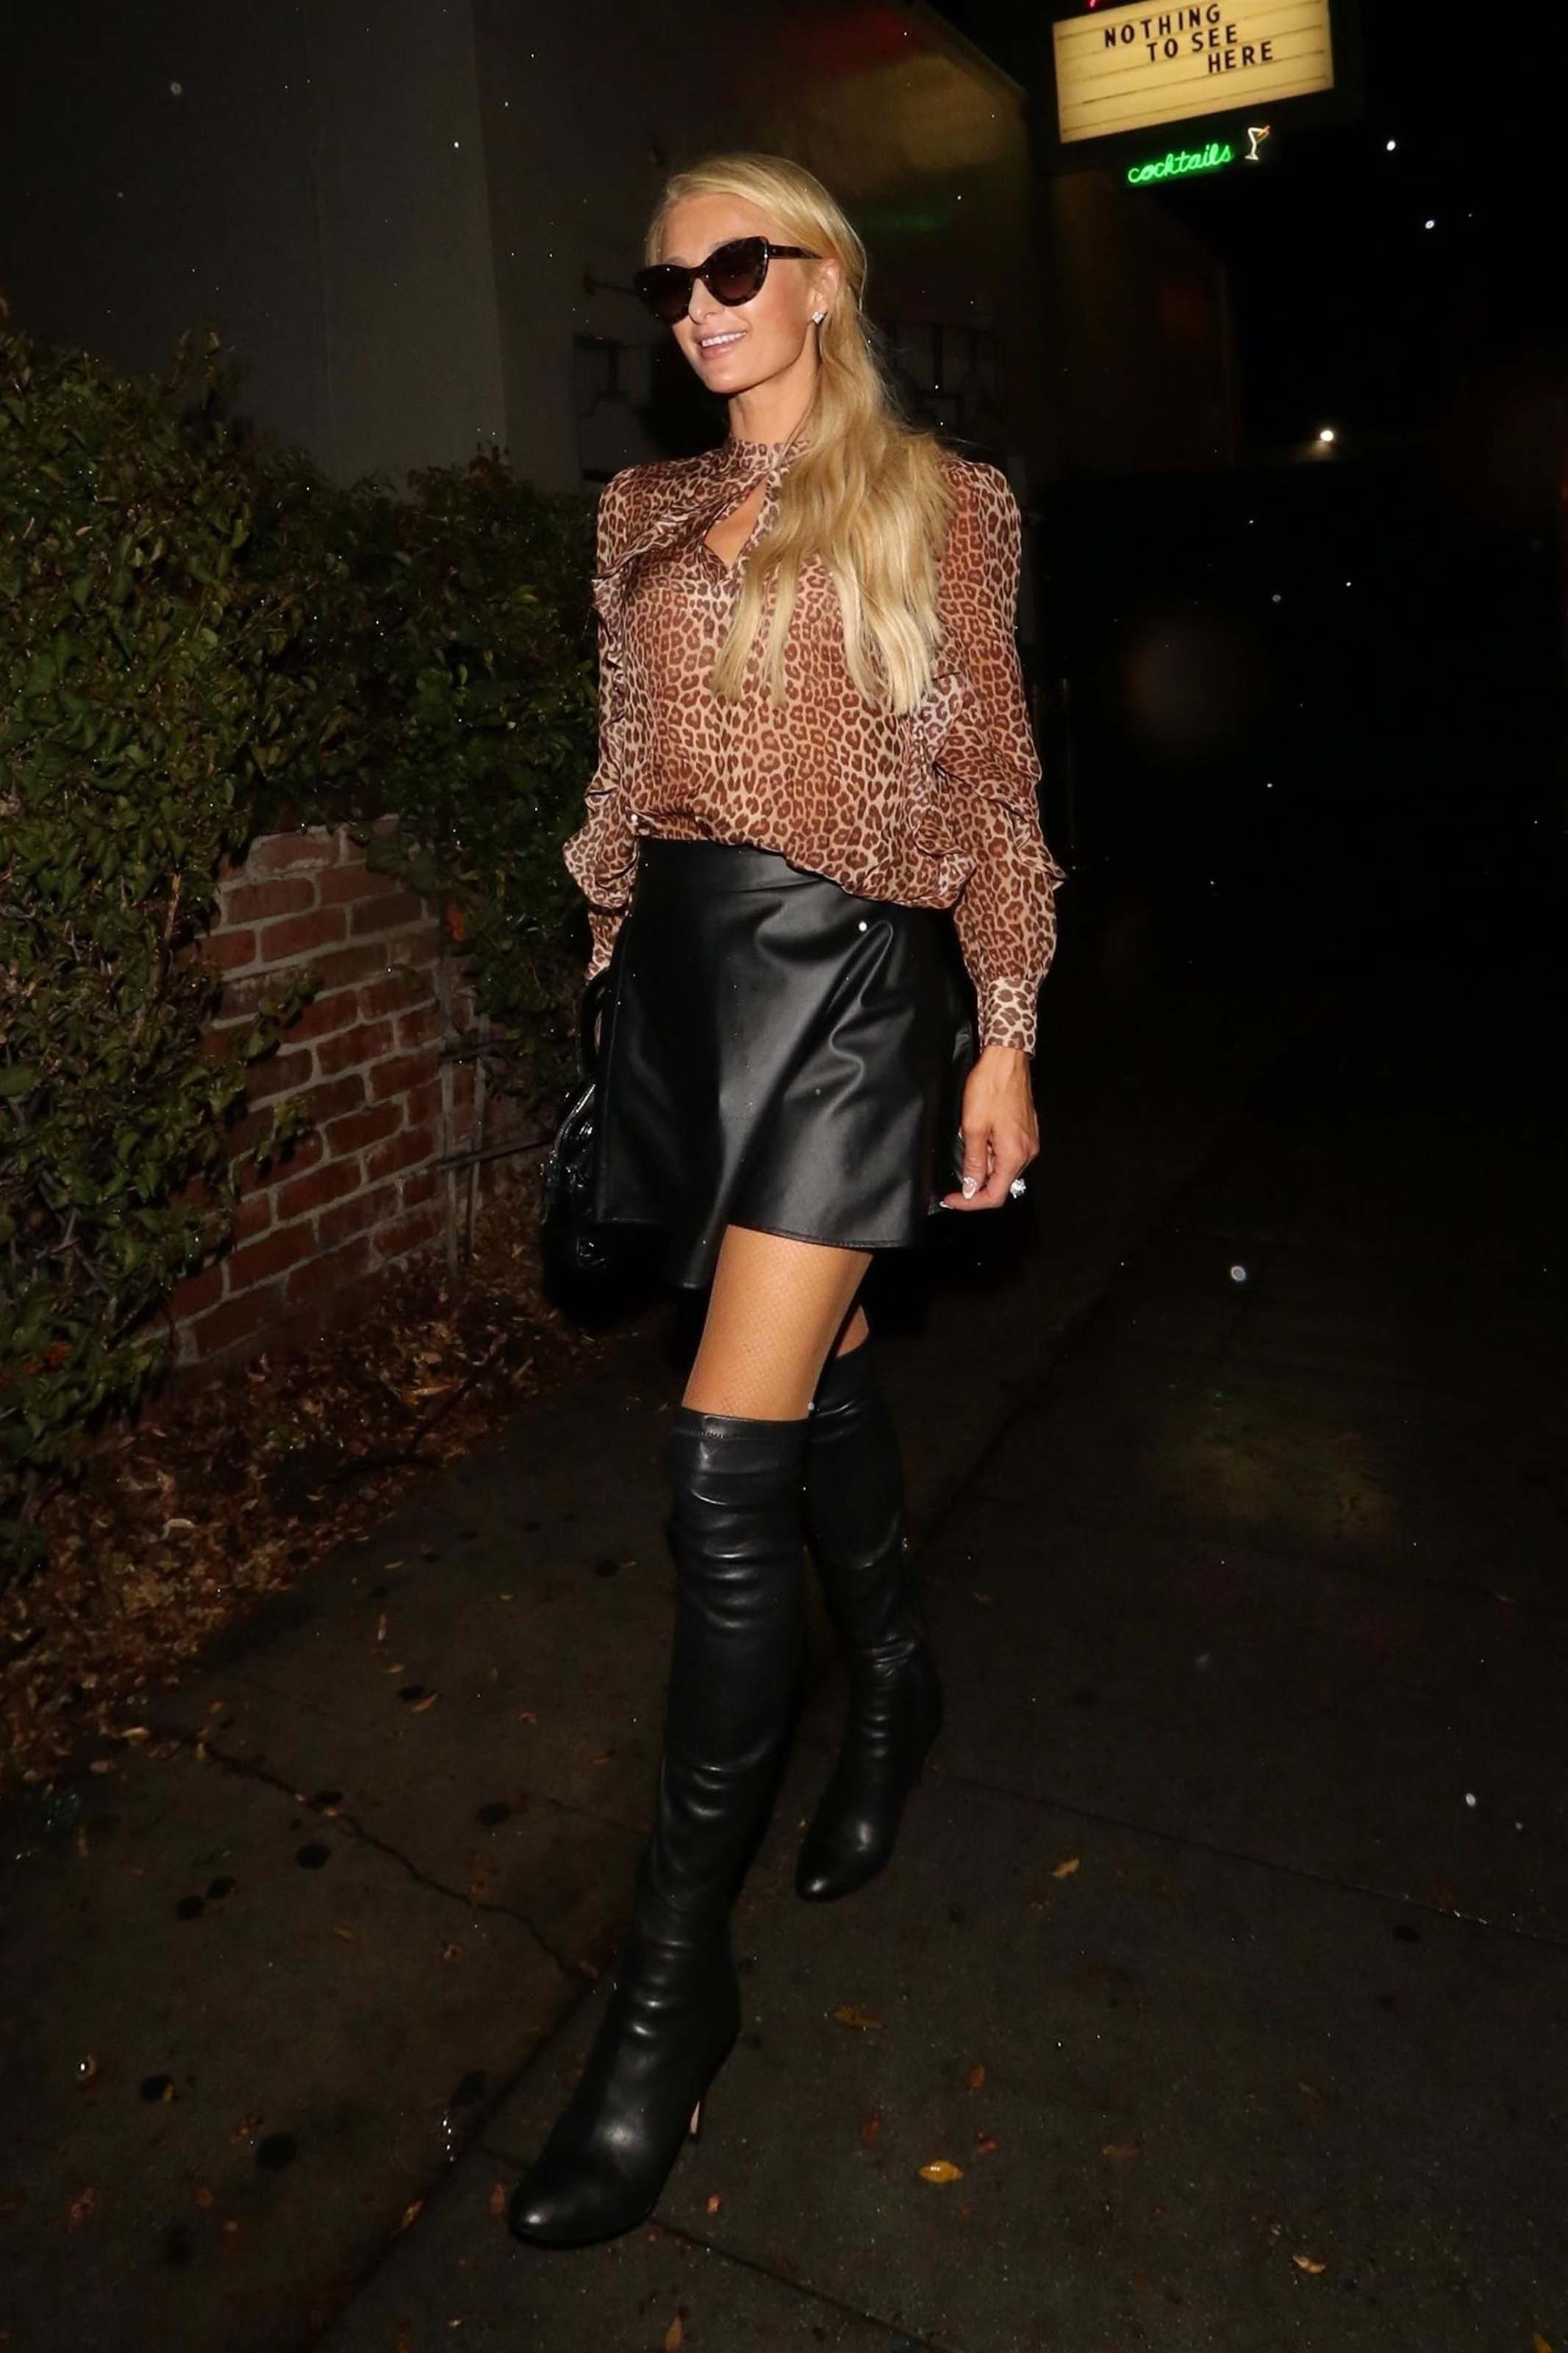 Paris Hilton leaving at Delilah Nightclub